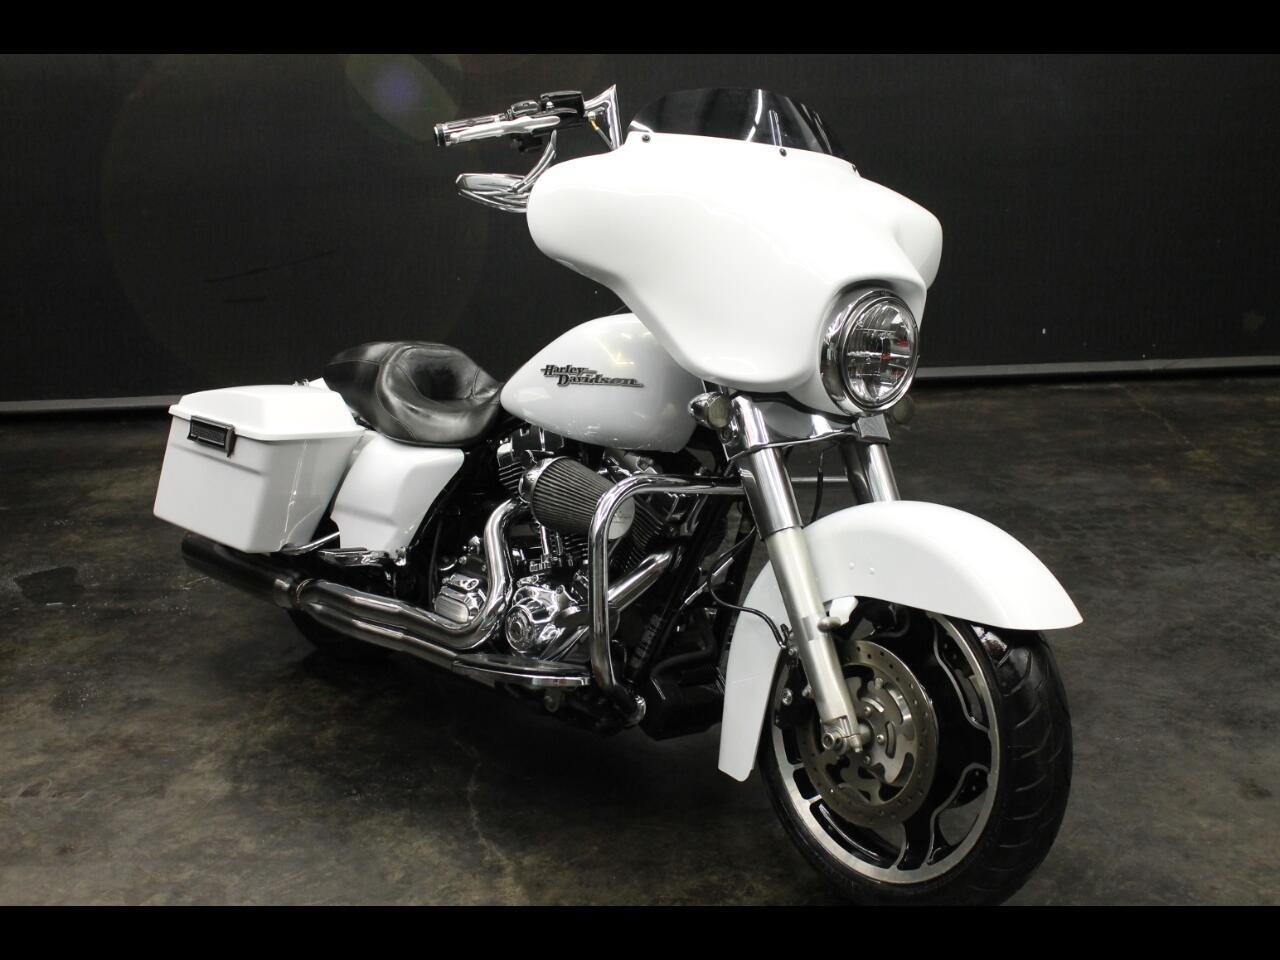 2012 Harley-Davidson FLHX Street Glide Custom